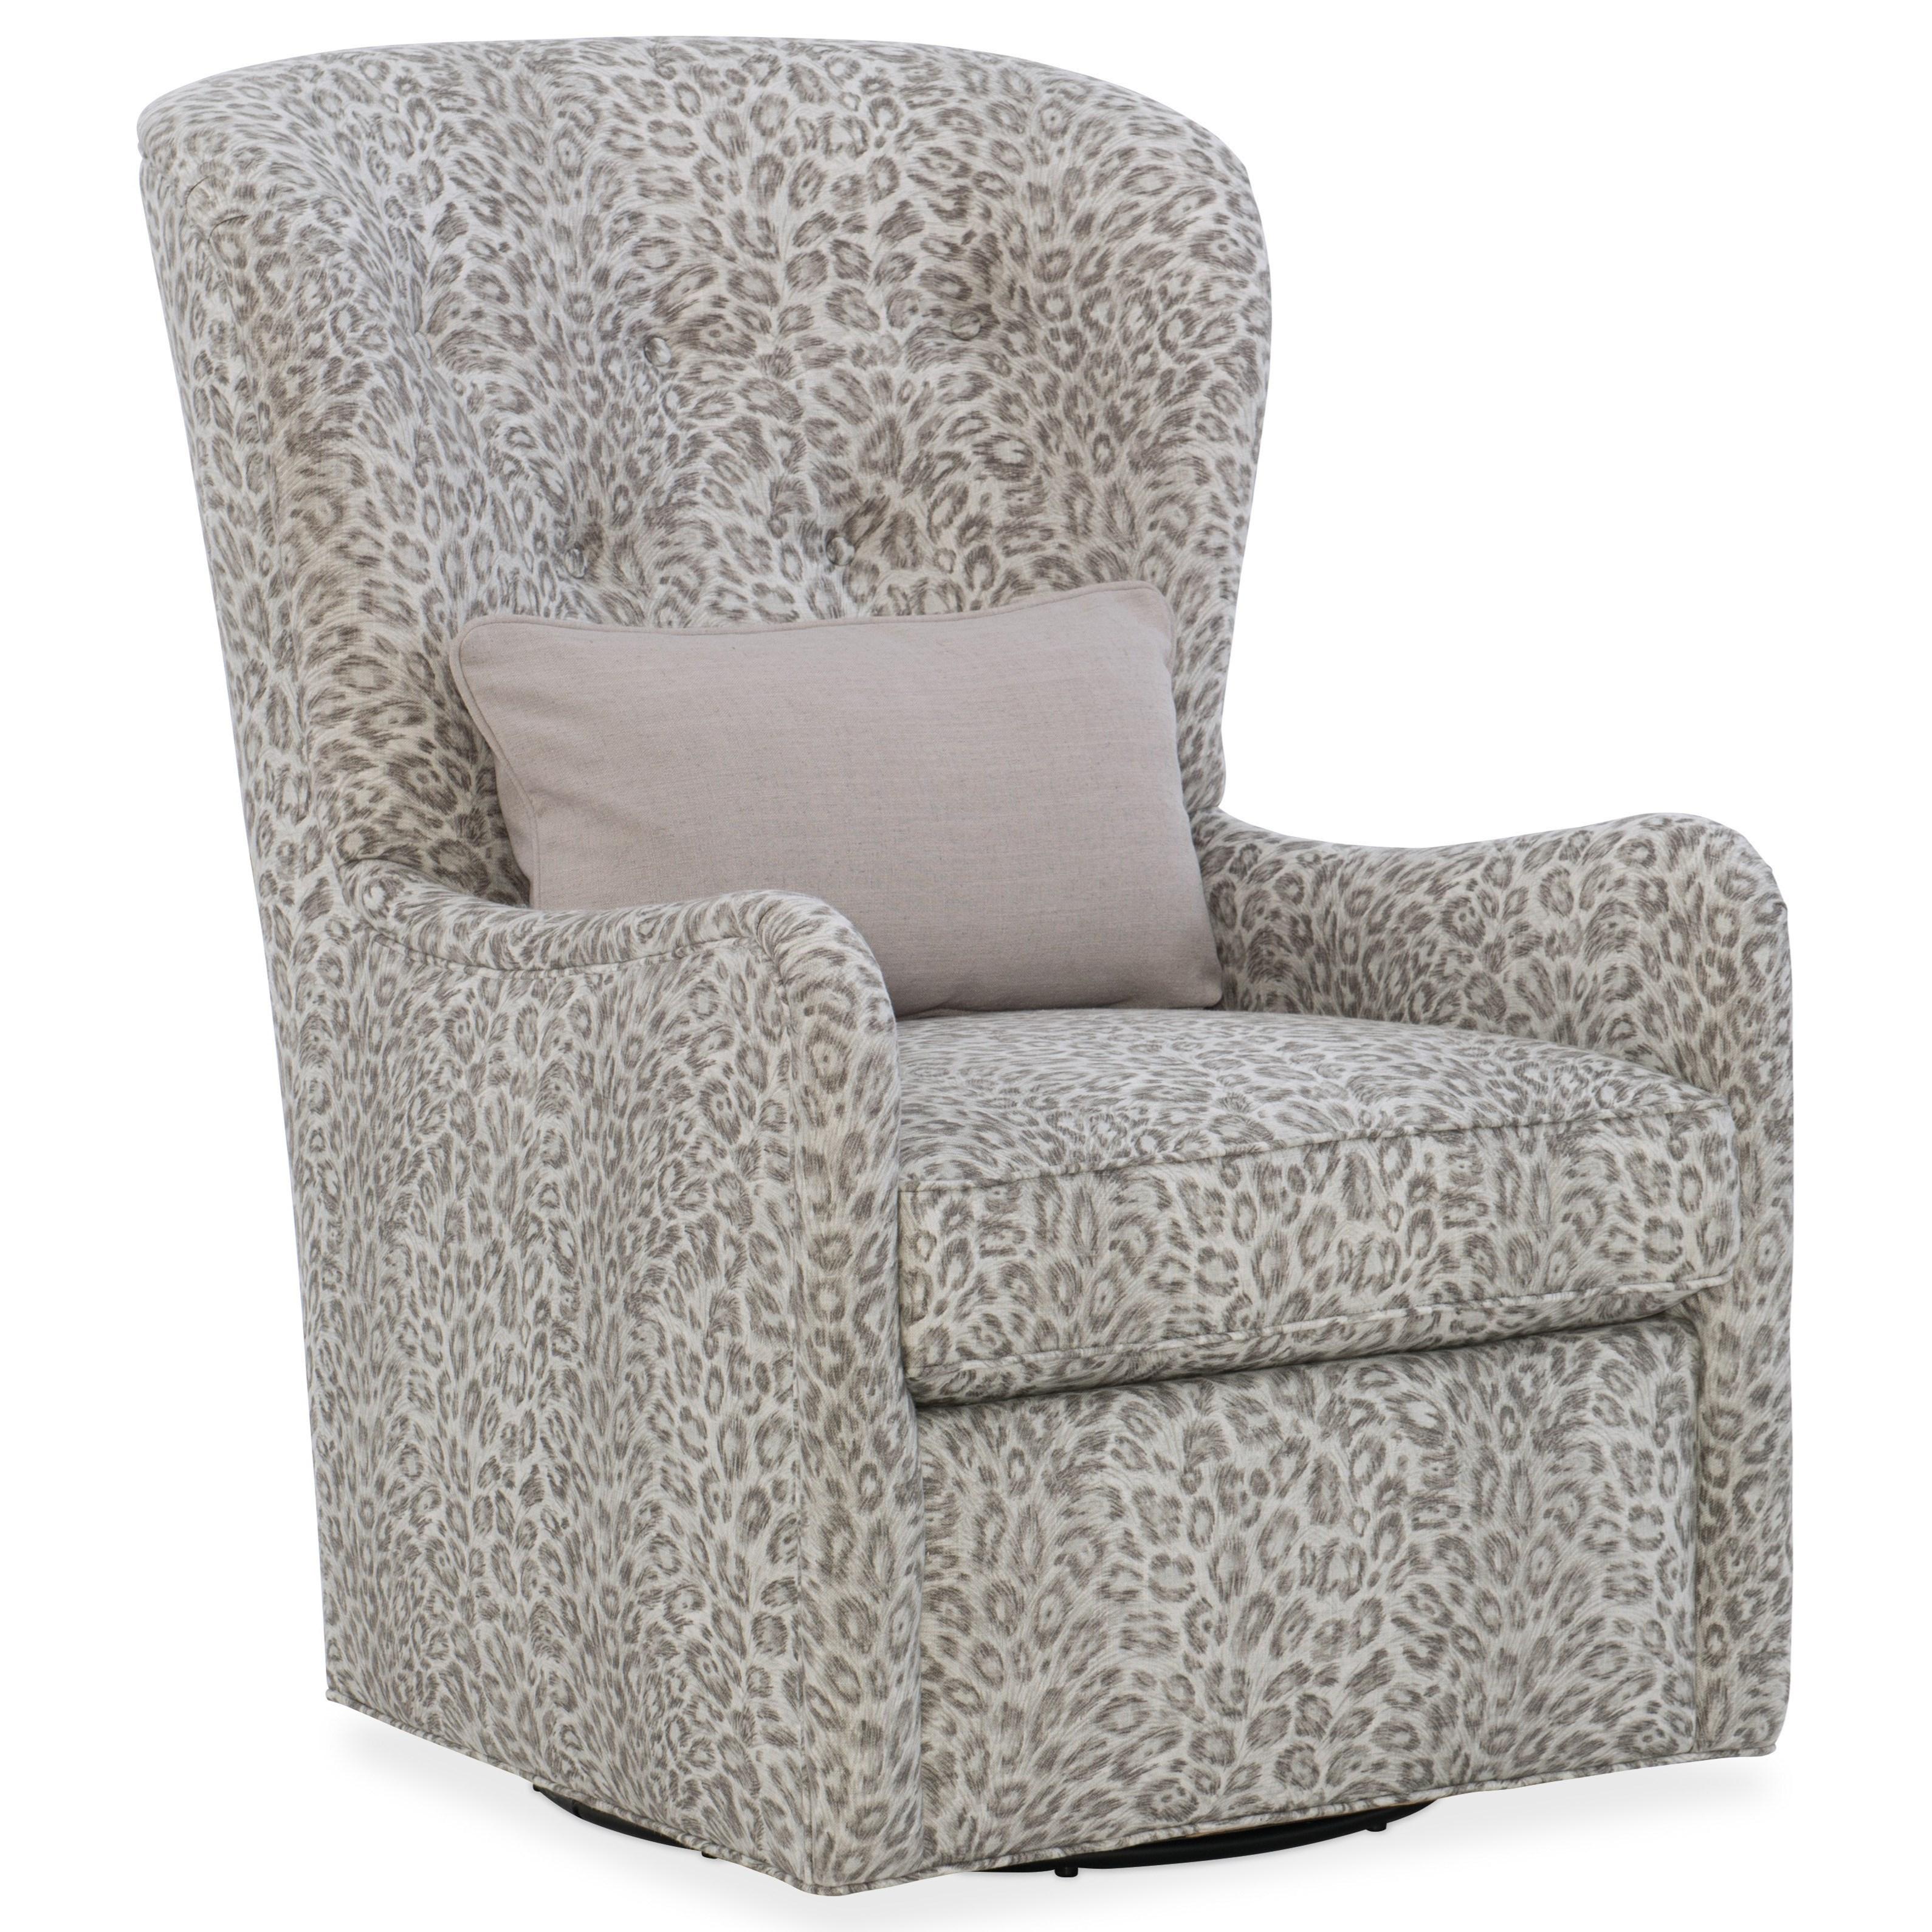 Sam Moore Mavis Transitional Tufted Back Swivel Chair